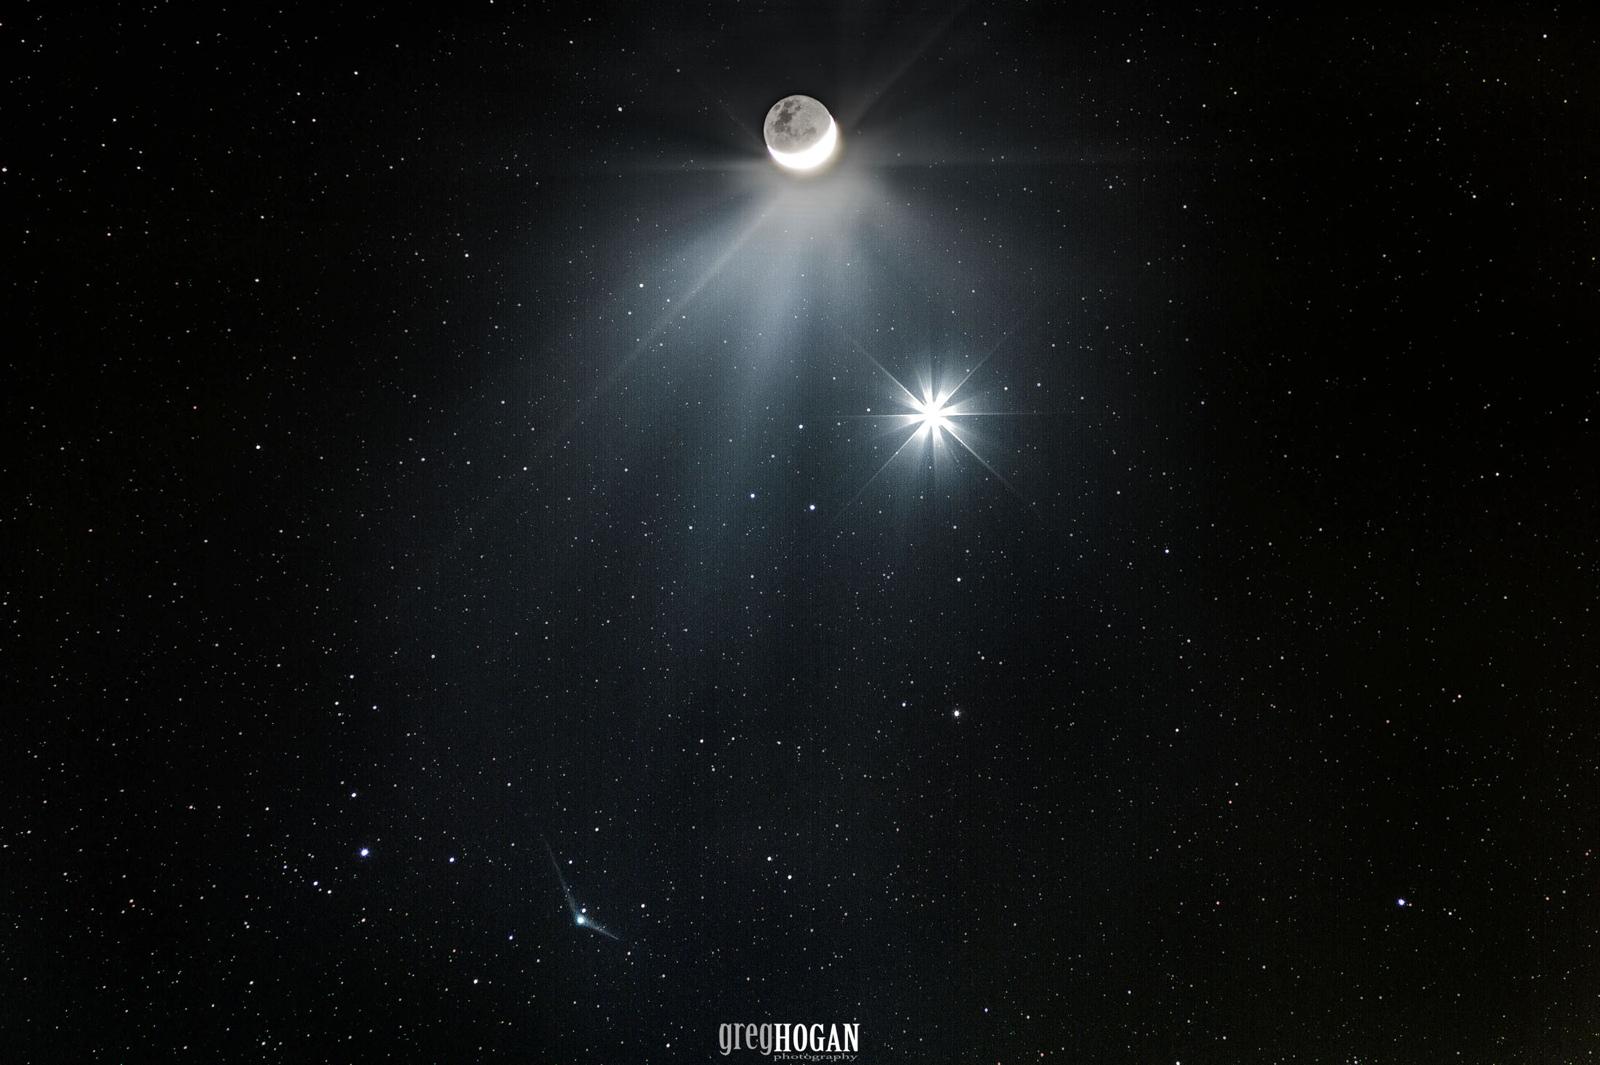 Comet Catalina, Venus, and the Moon